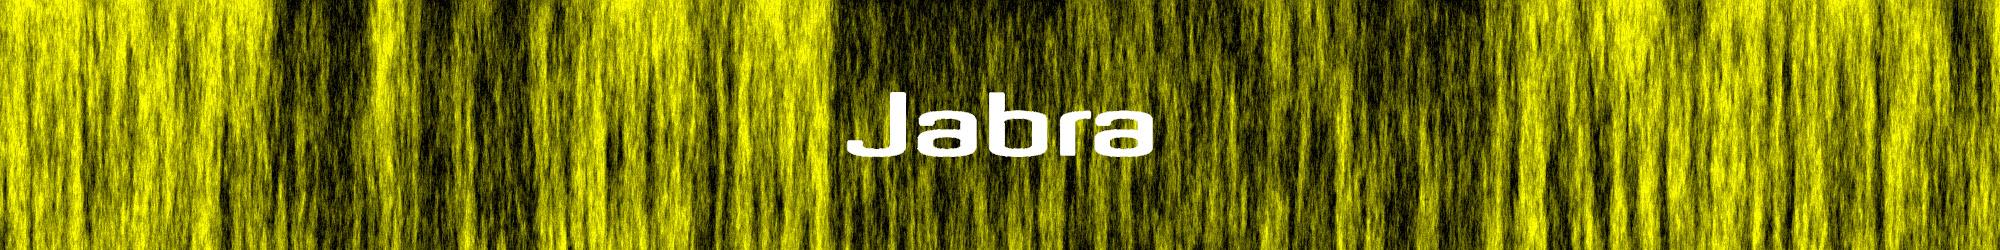 Jabra banner